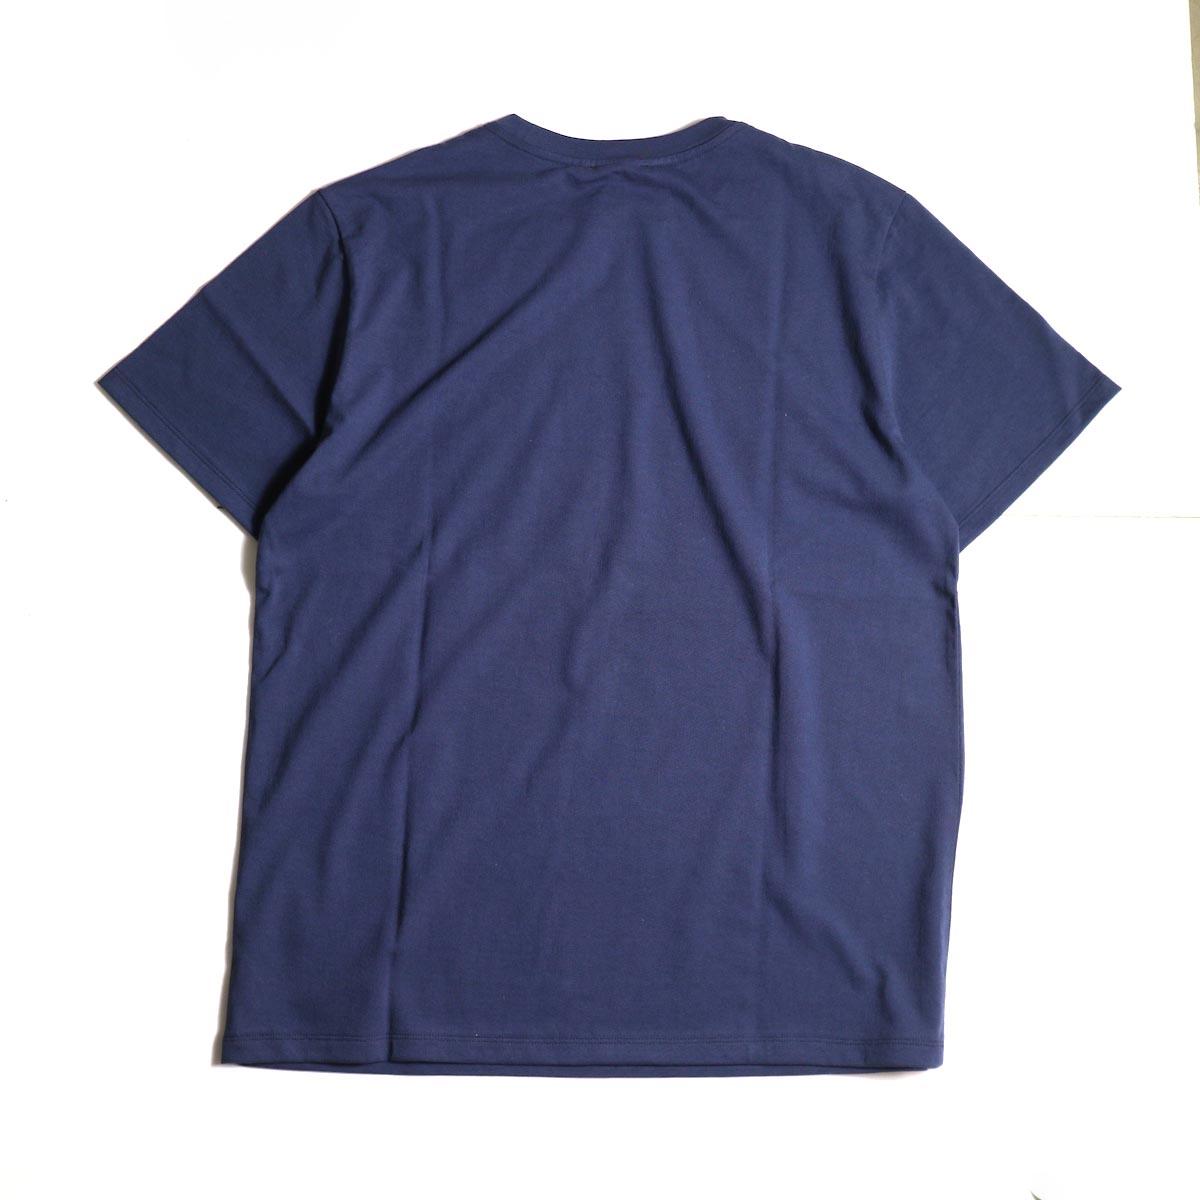 A.P.C. / Crew Neck Tee (Raymond T-shirt) -Navy背面